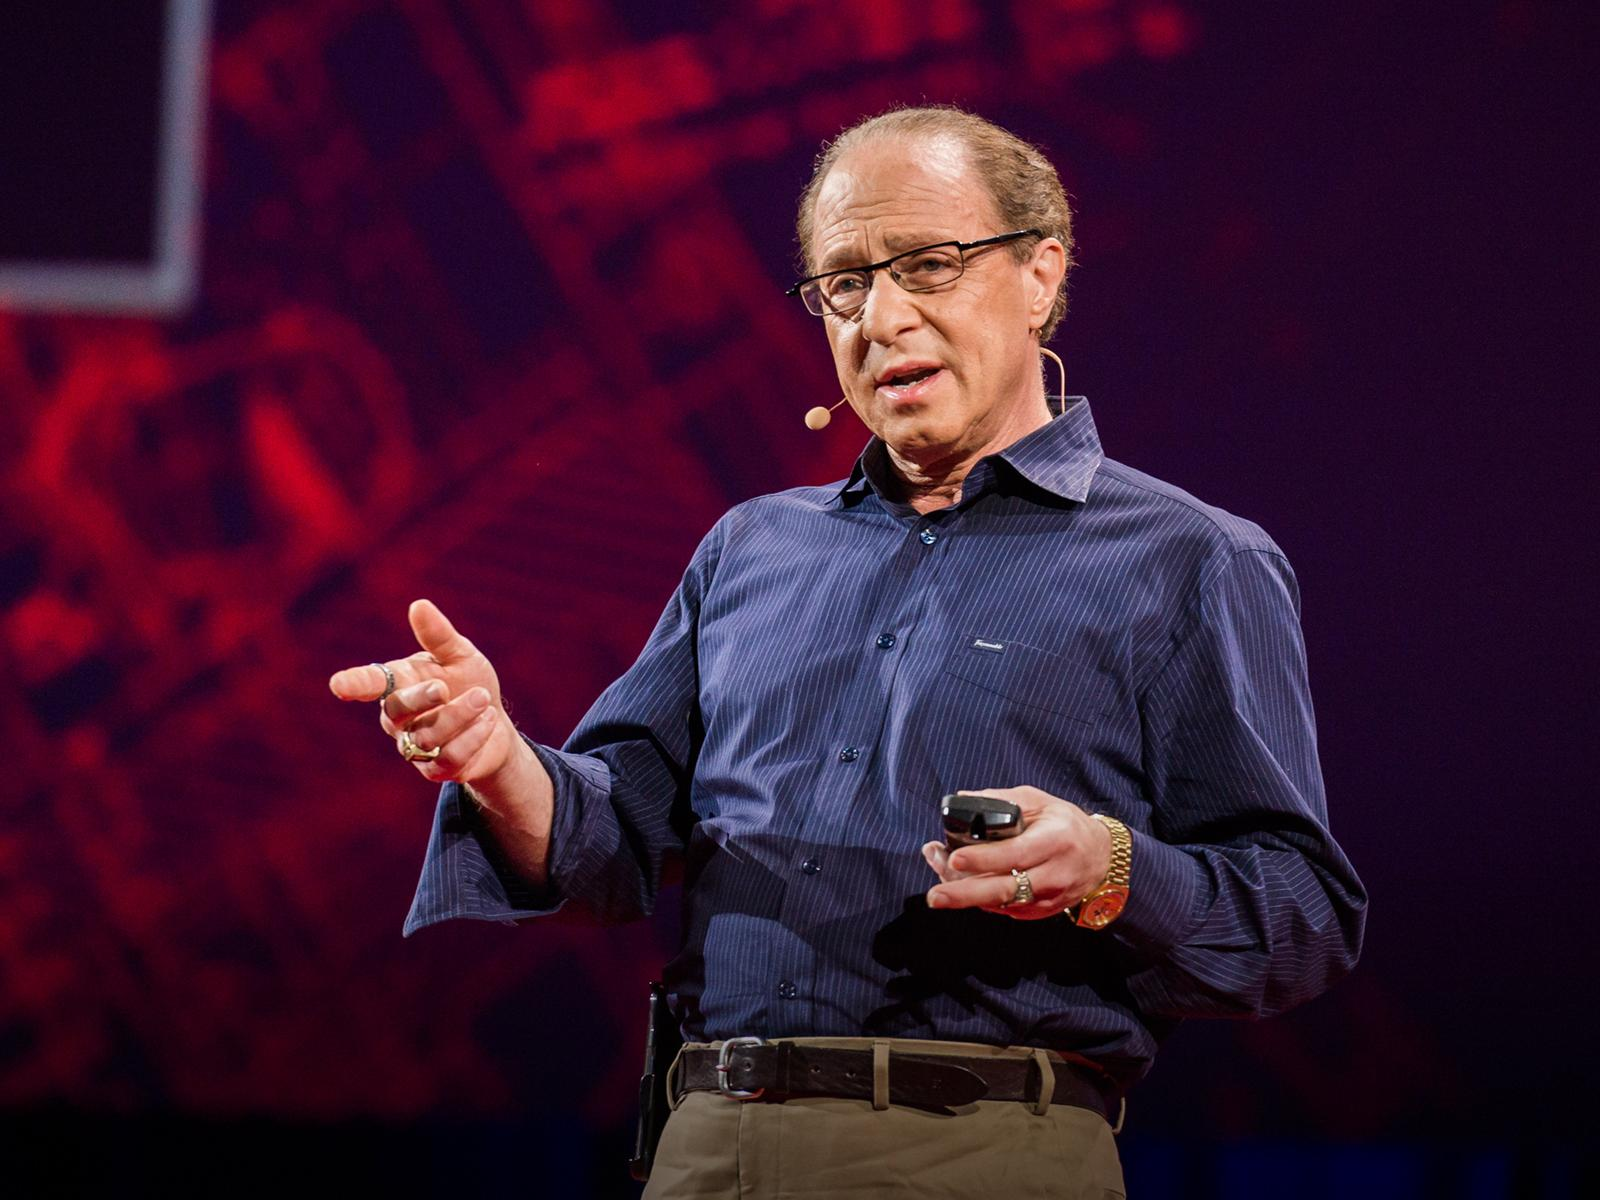 Get ready for hybrid thinking | Ray Kurzweil